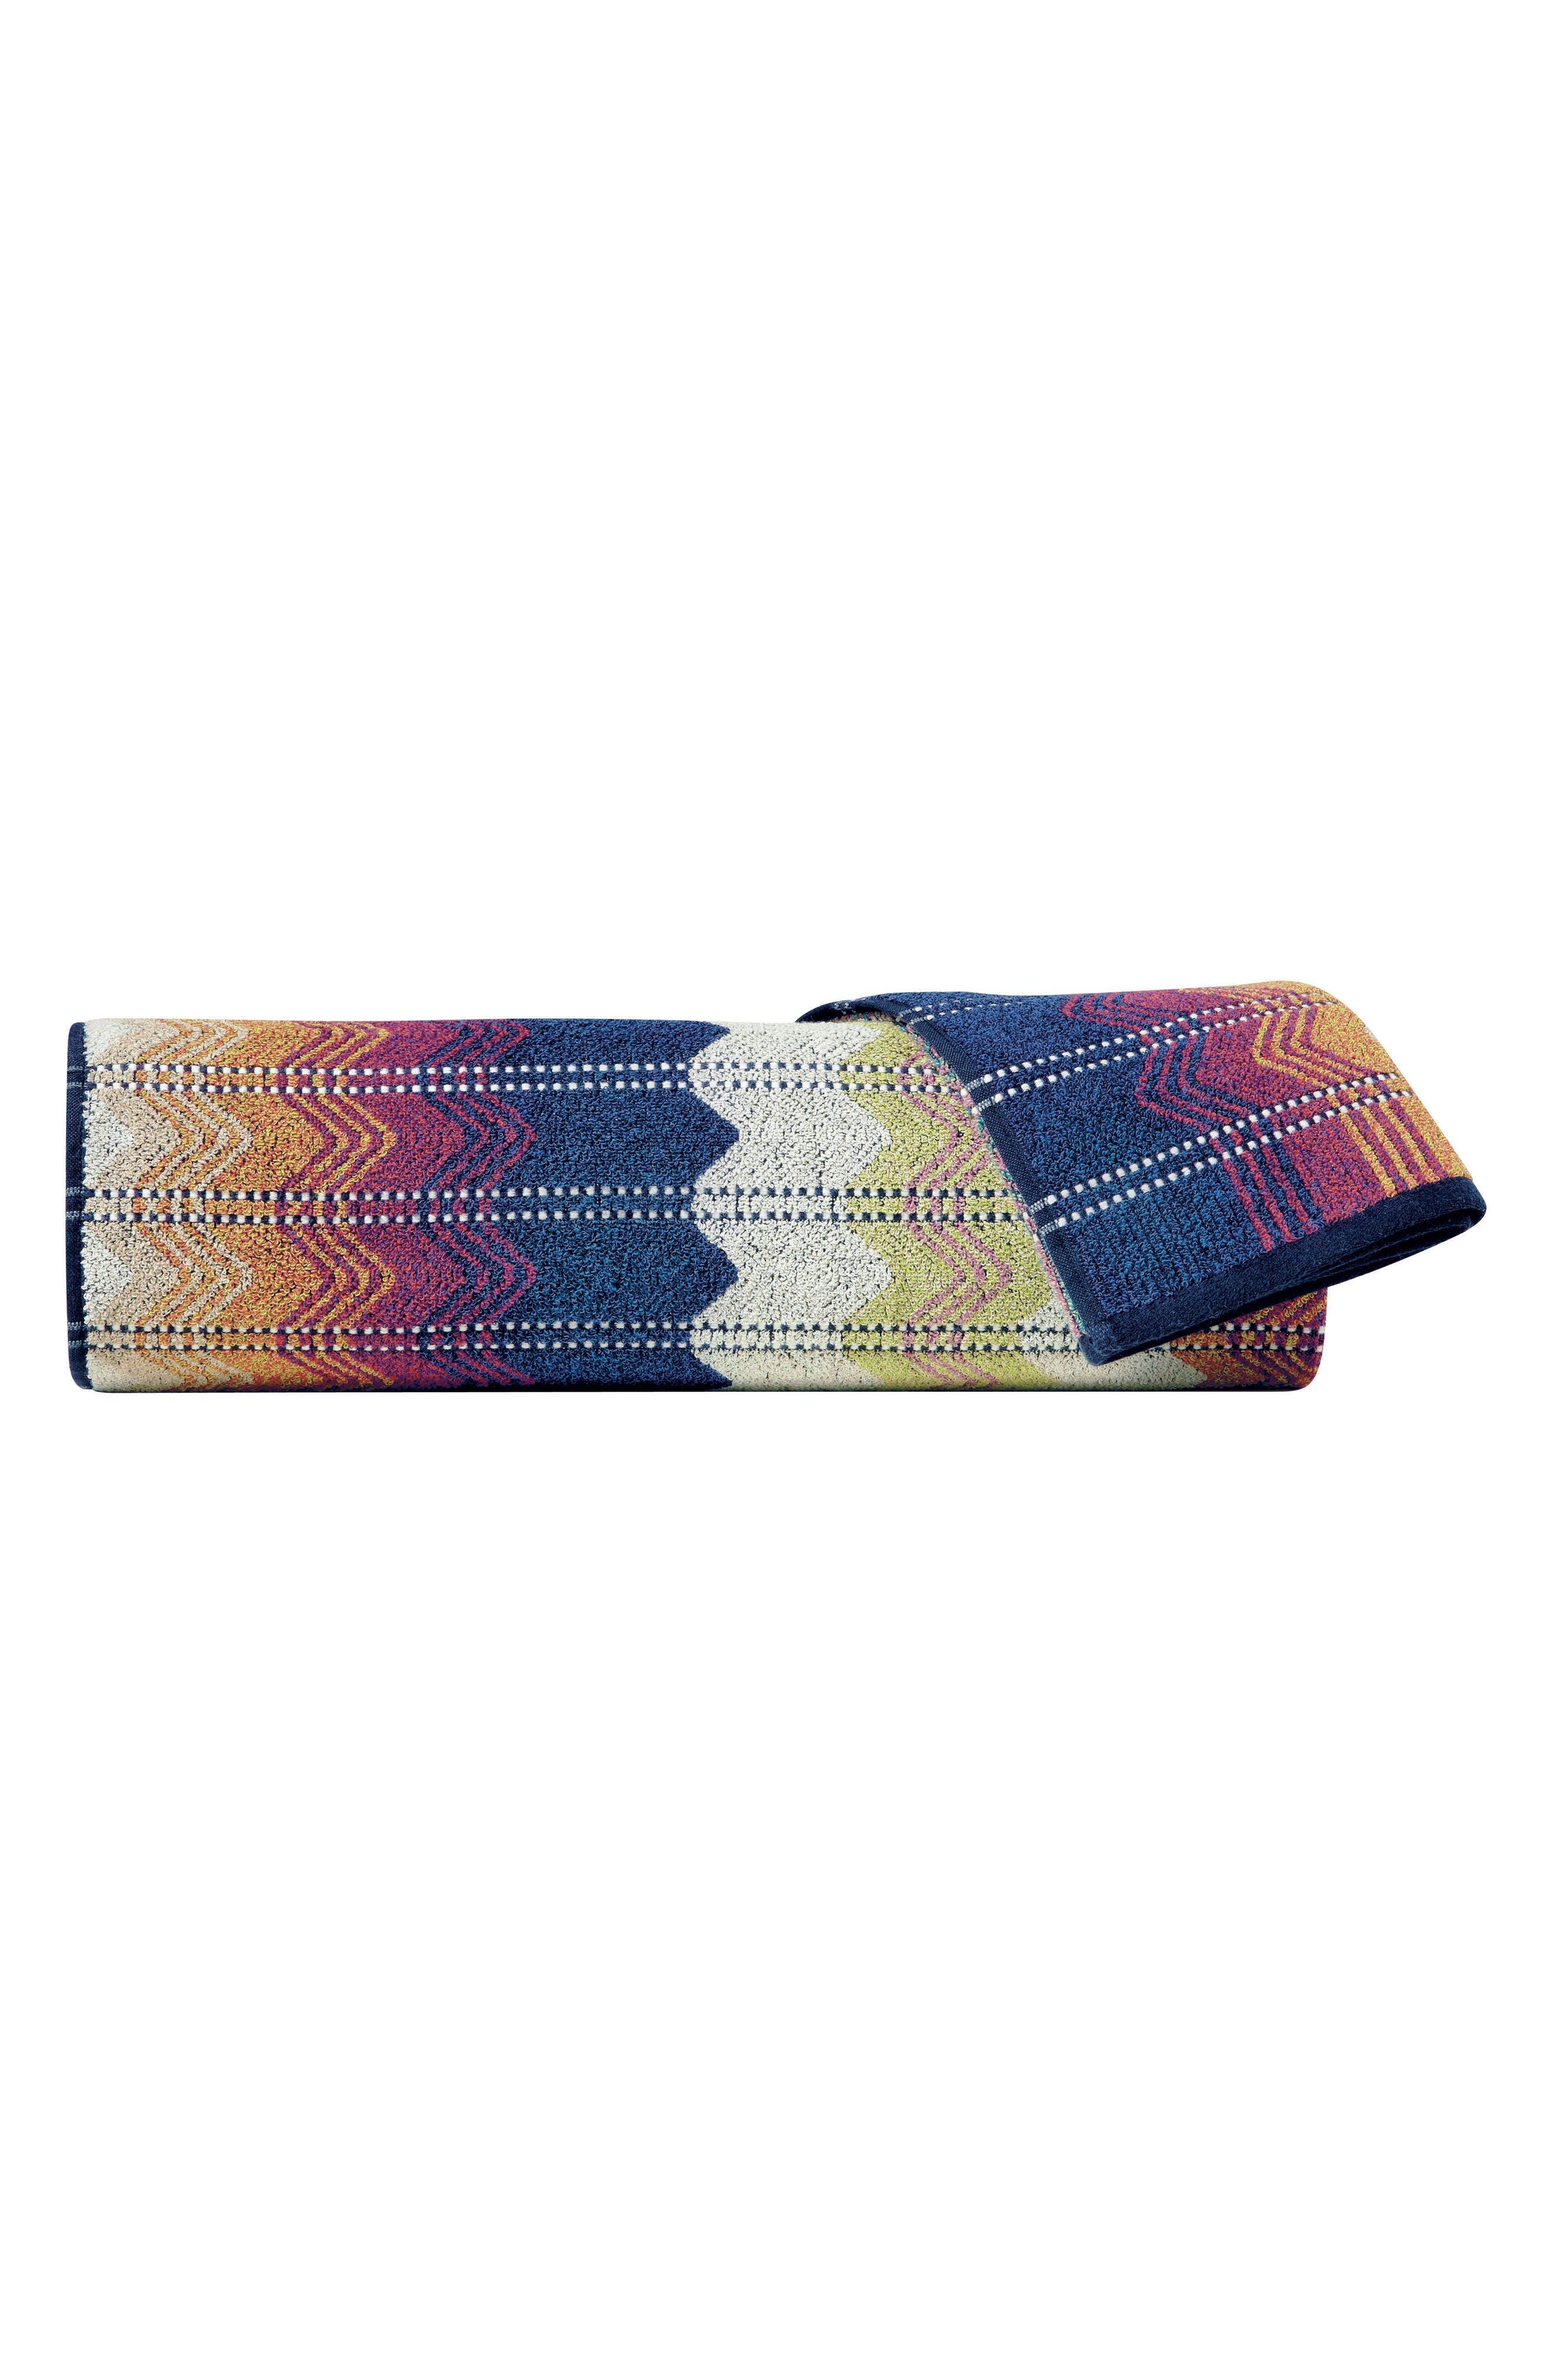 Travis Bath Towel,                         Main,                         color, Multi Color